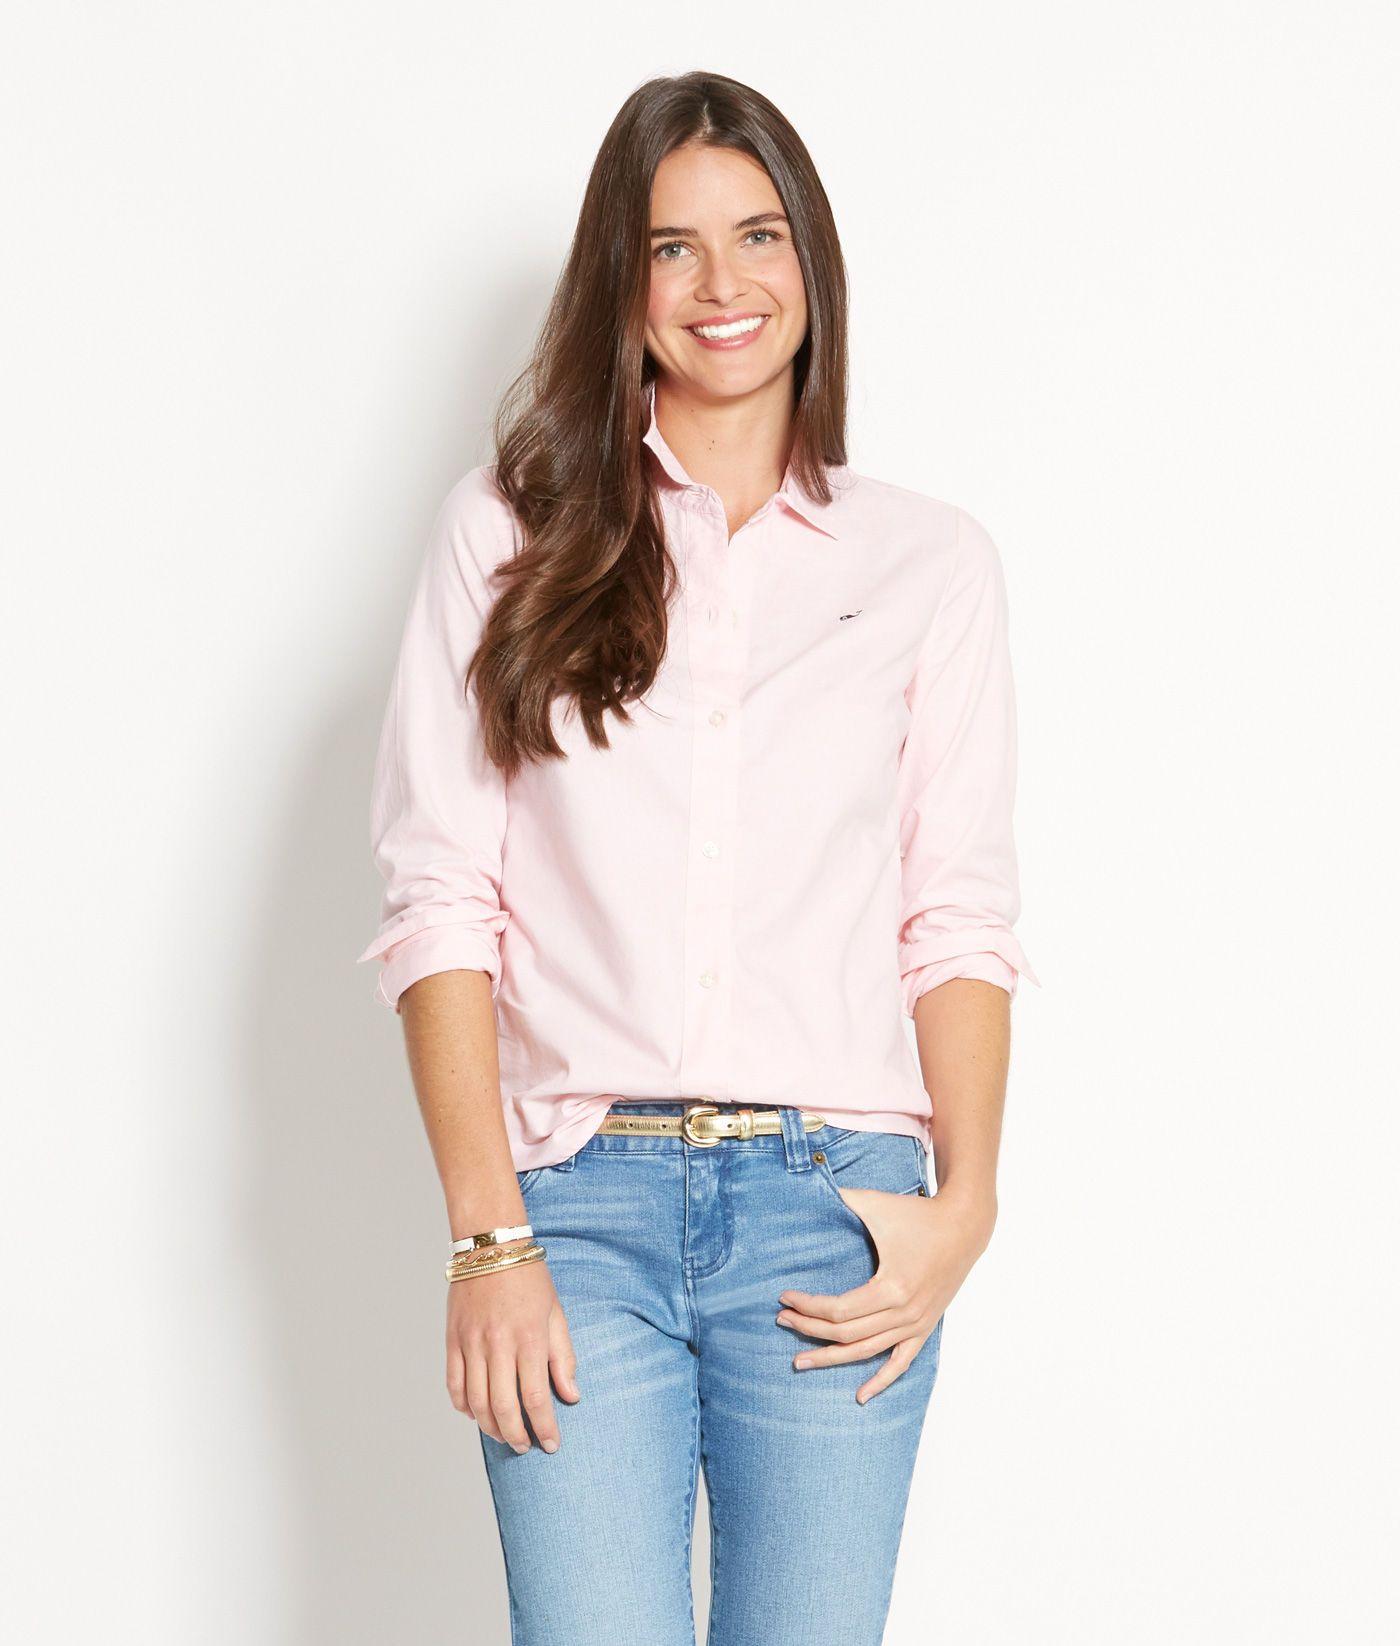 e41b5a7e2 Women's Button down Shirts: White Oxford shirt for Women – Vineyard Vines